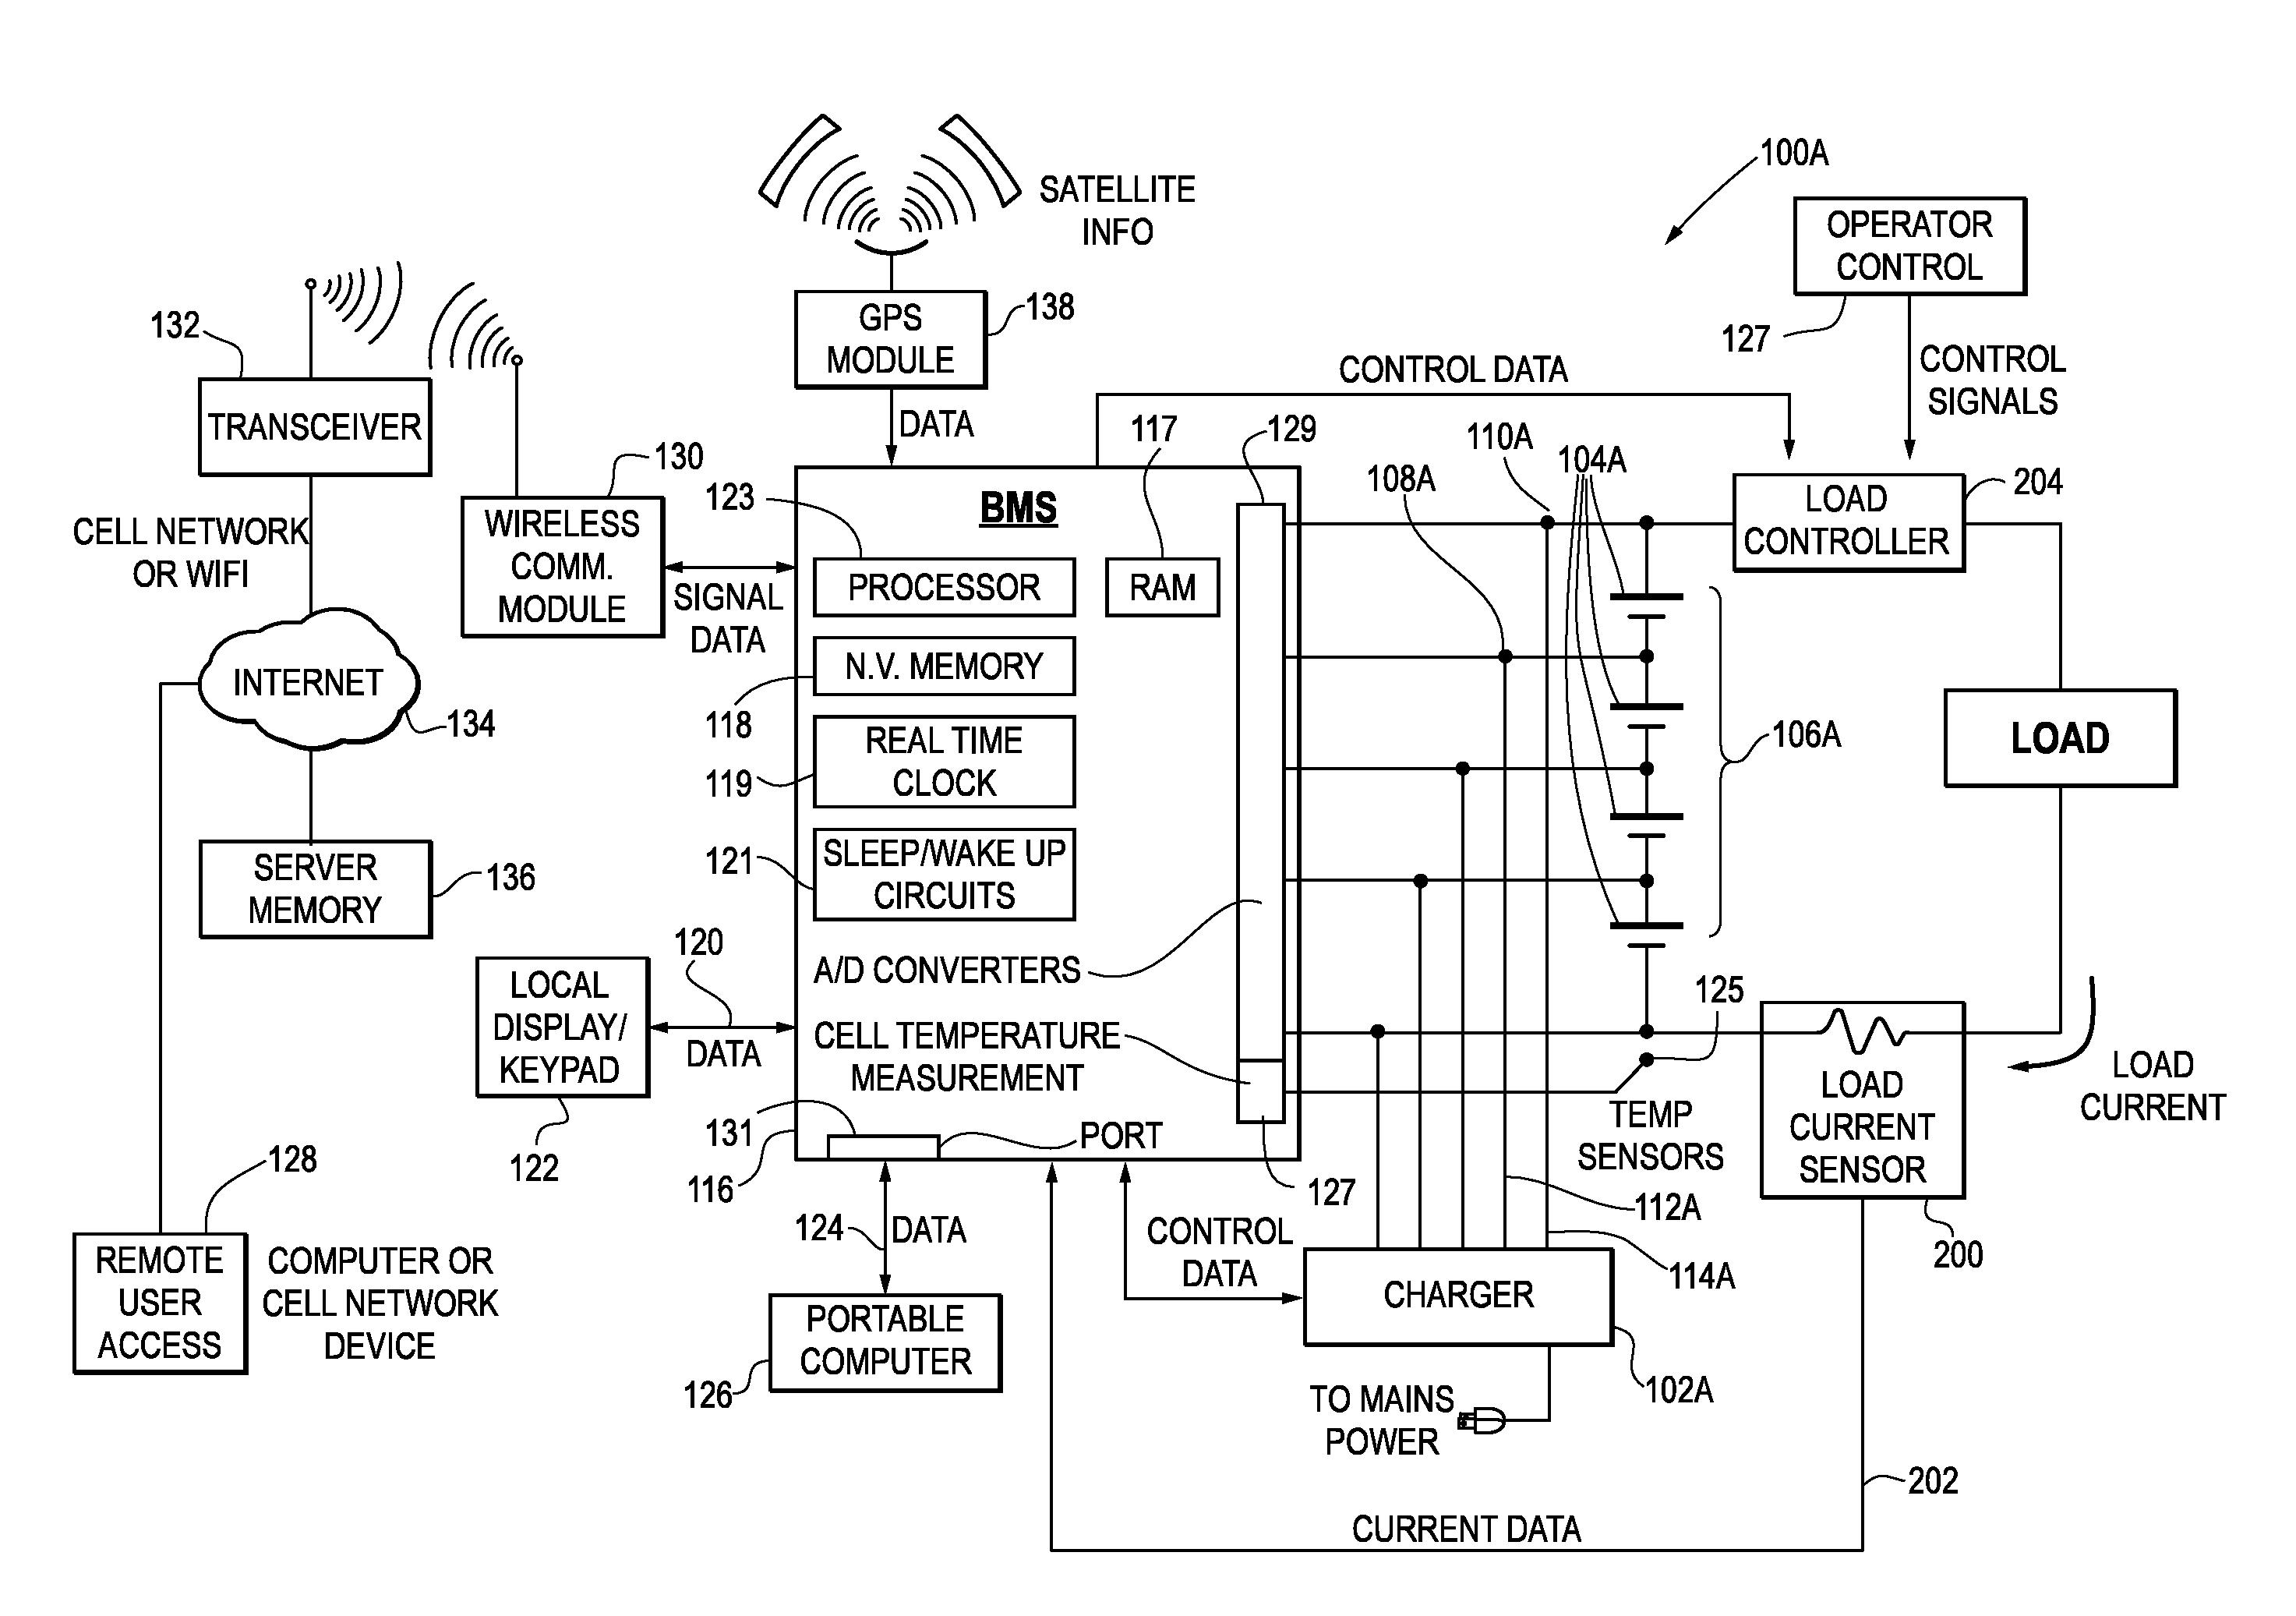 nexon central locking wiring diagram